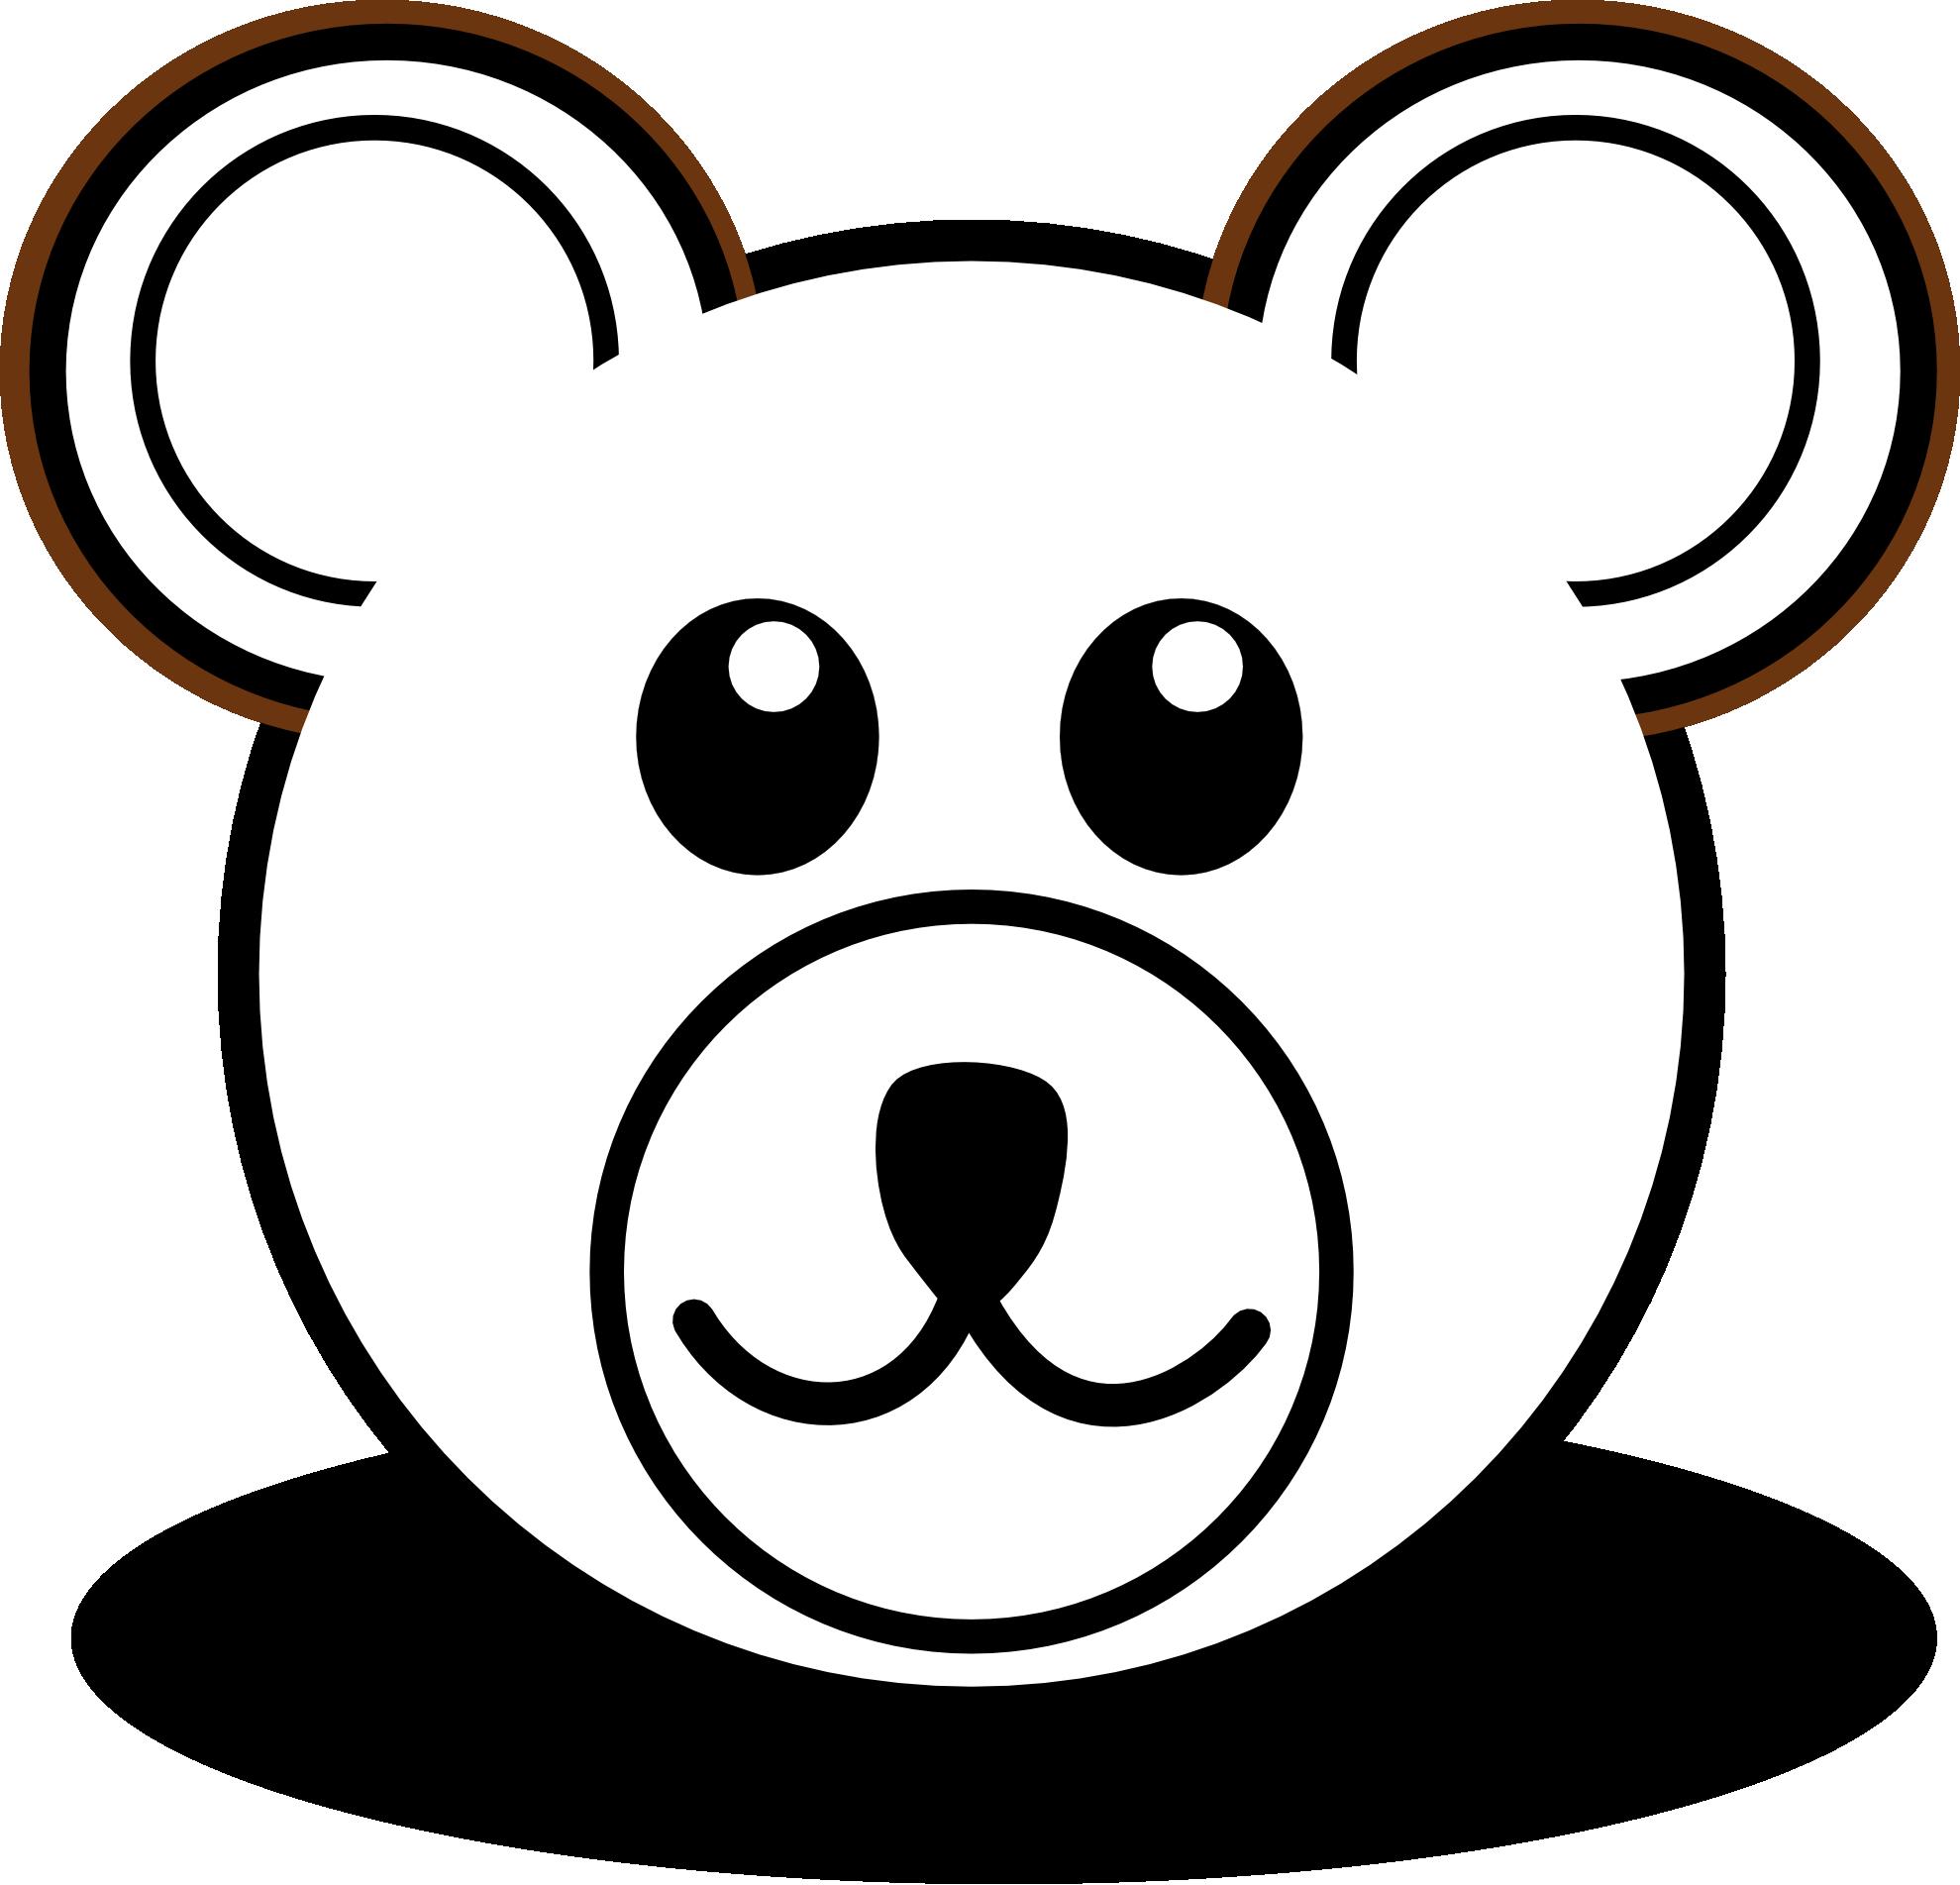 Bear 3 Head Cartoon Brown Black White Line Art Teddy Bear.